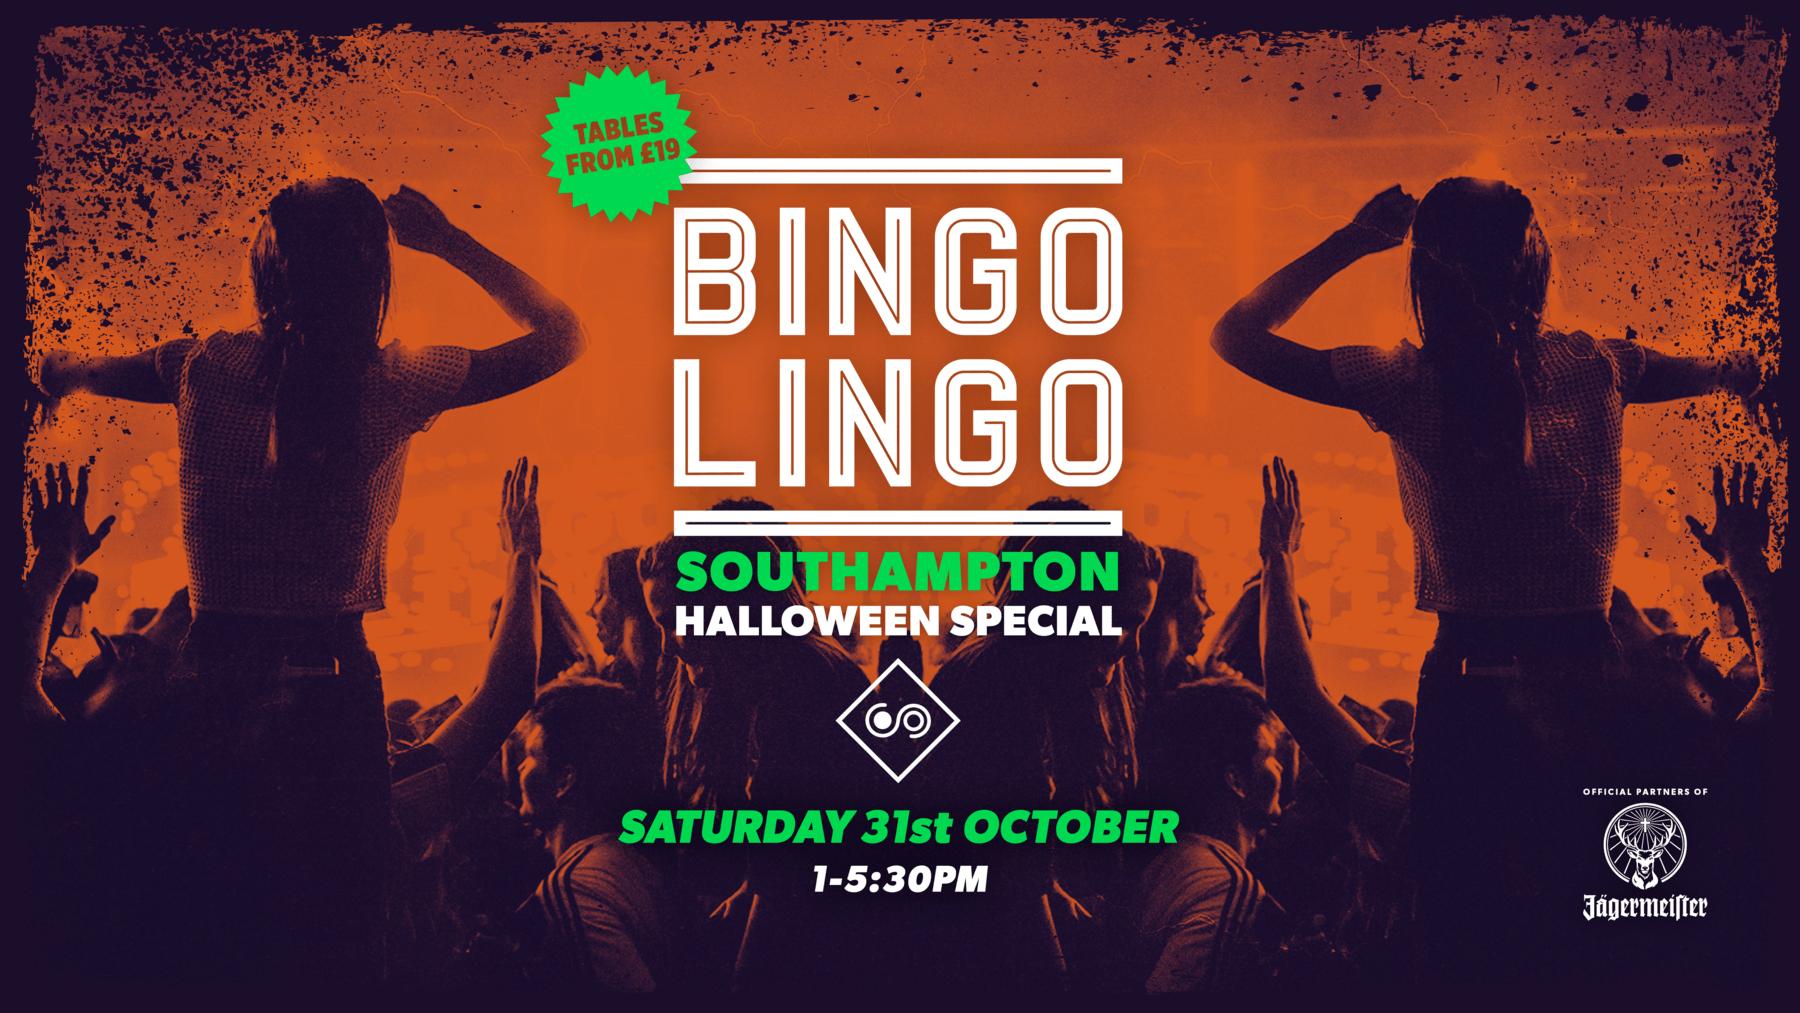 *SOLD OUT* – BINGO LINGO – Southampton – HALLOWEEN SPECIAL!